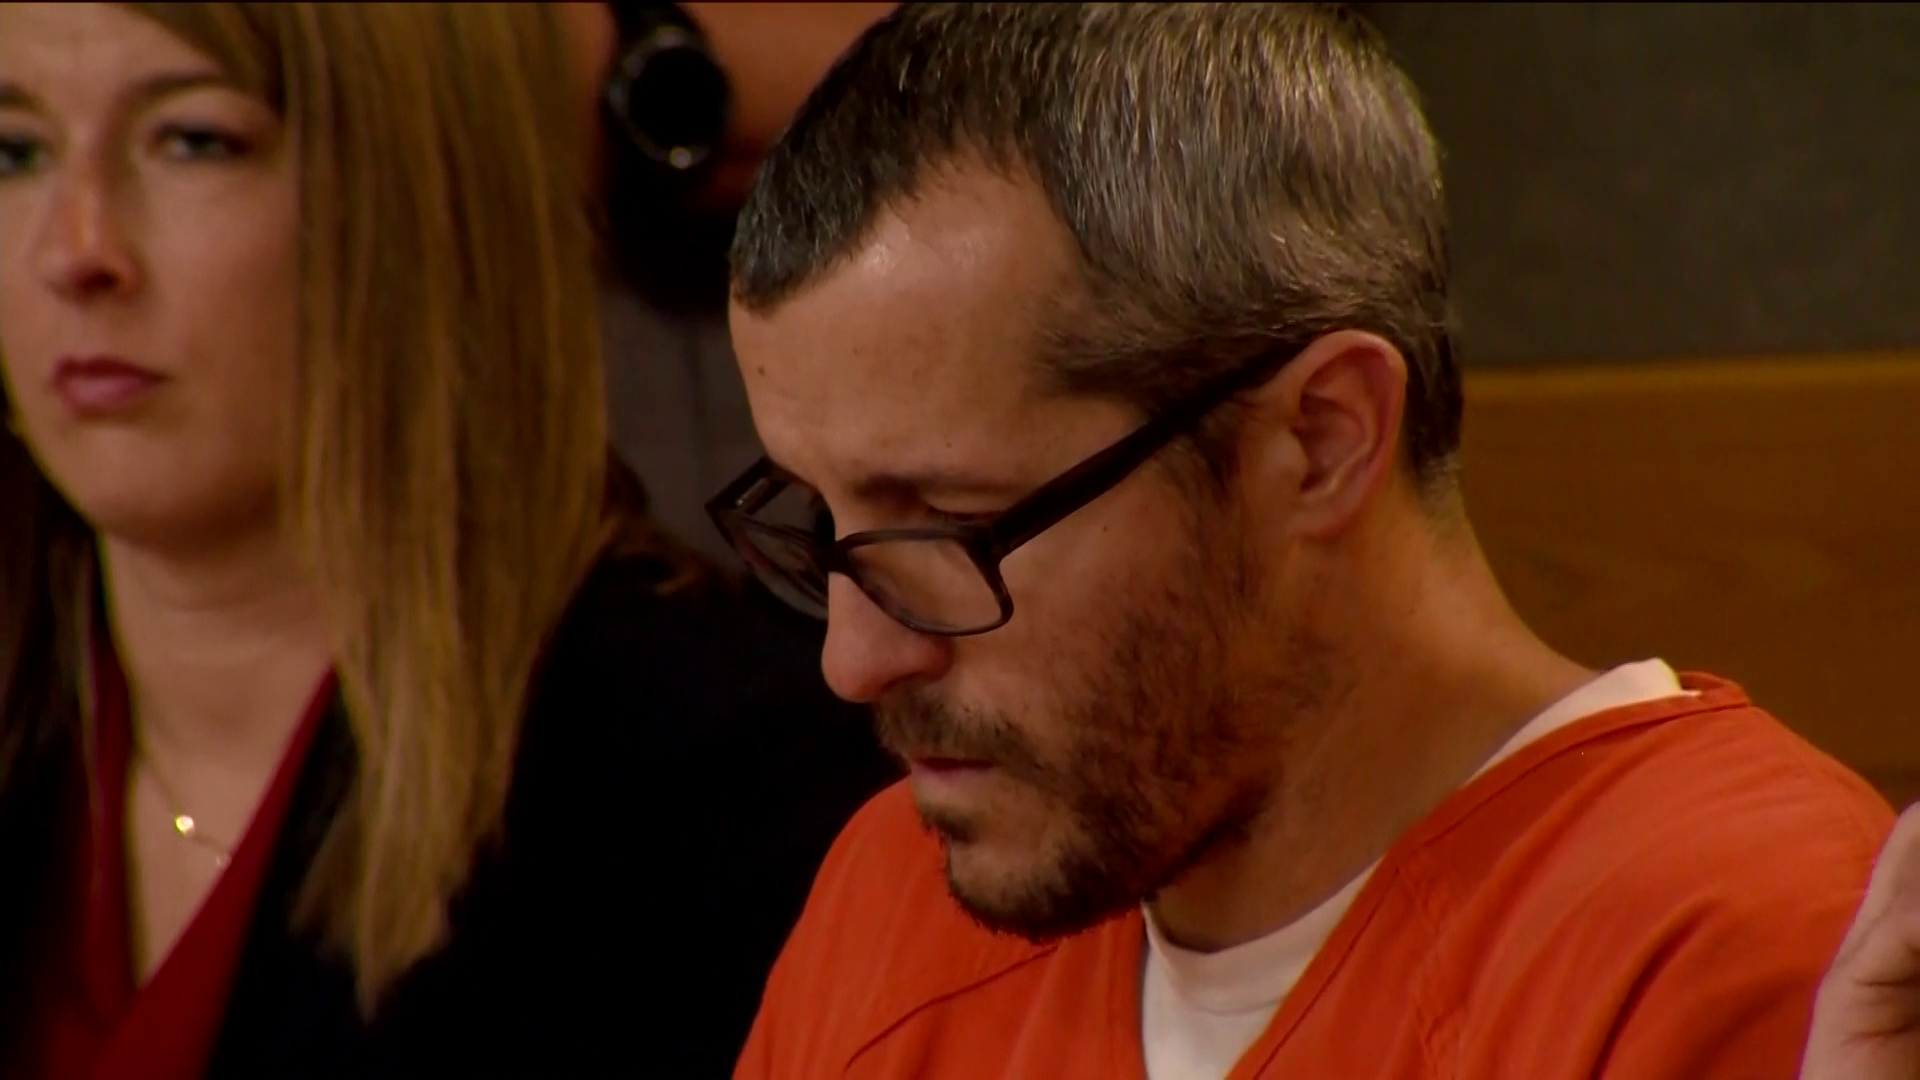 Chris Watts sentencing: Colorado man sentenced to life